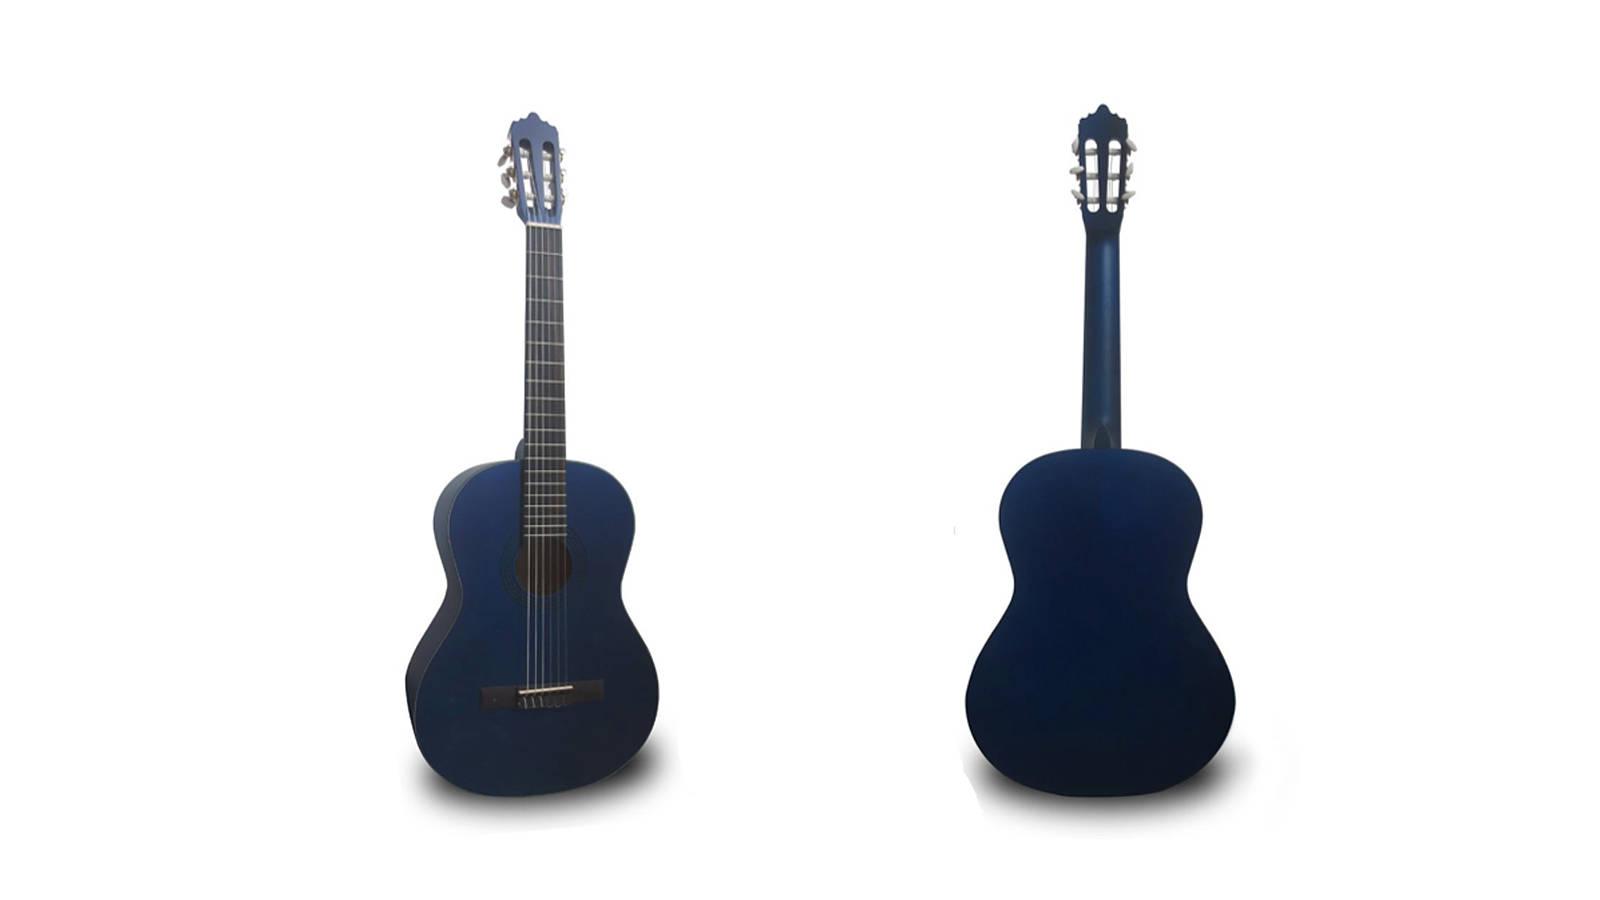 La Mancha Rubinito Azul SM 59 Konzertgitarre 3/4